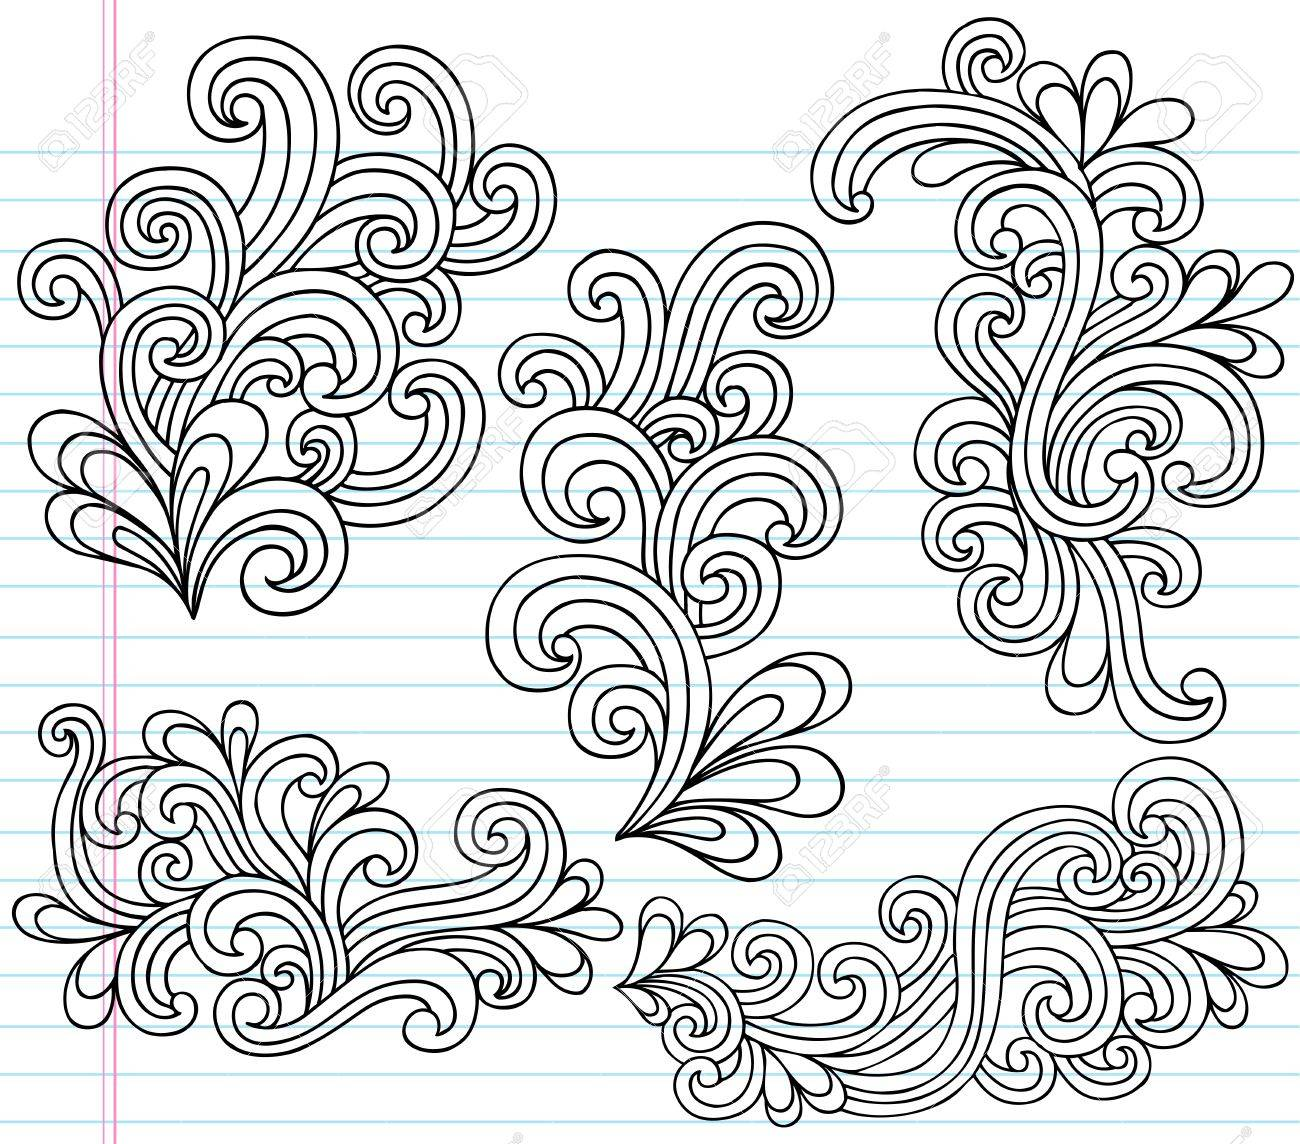 Notebook Doodle Swirly Vector Illustration Design Elements Stock Vector - 11792477